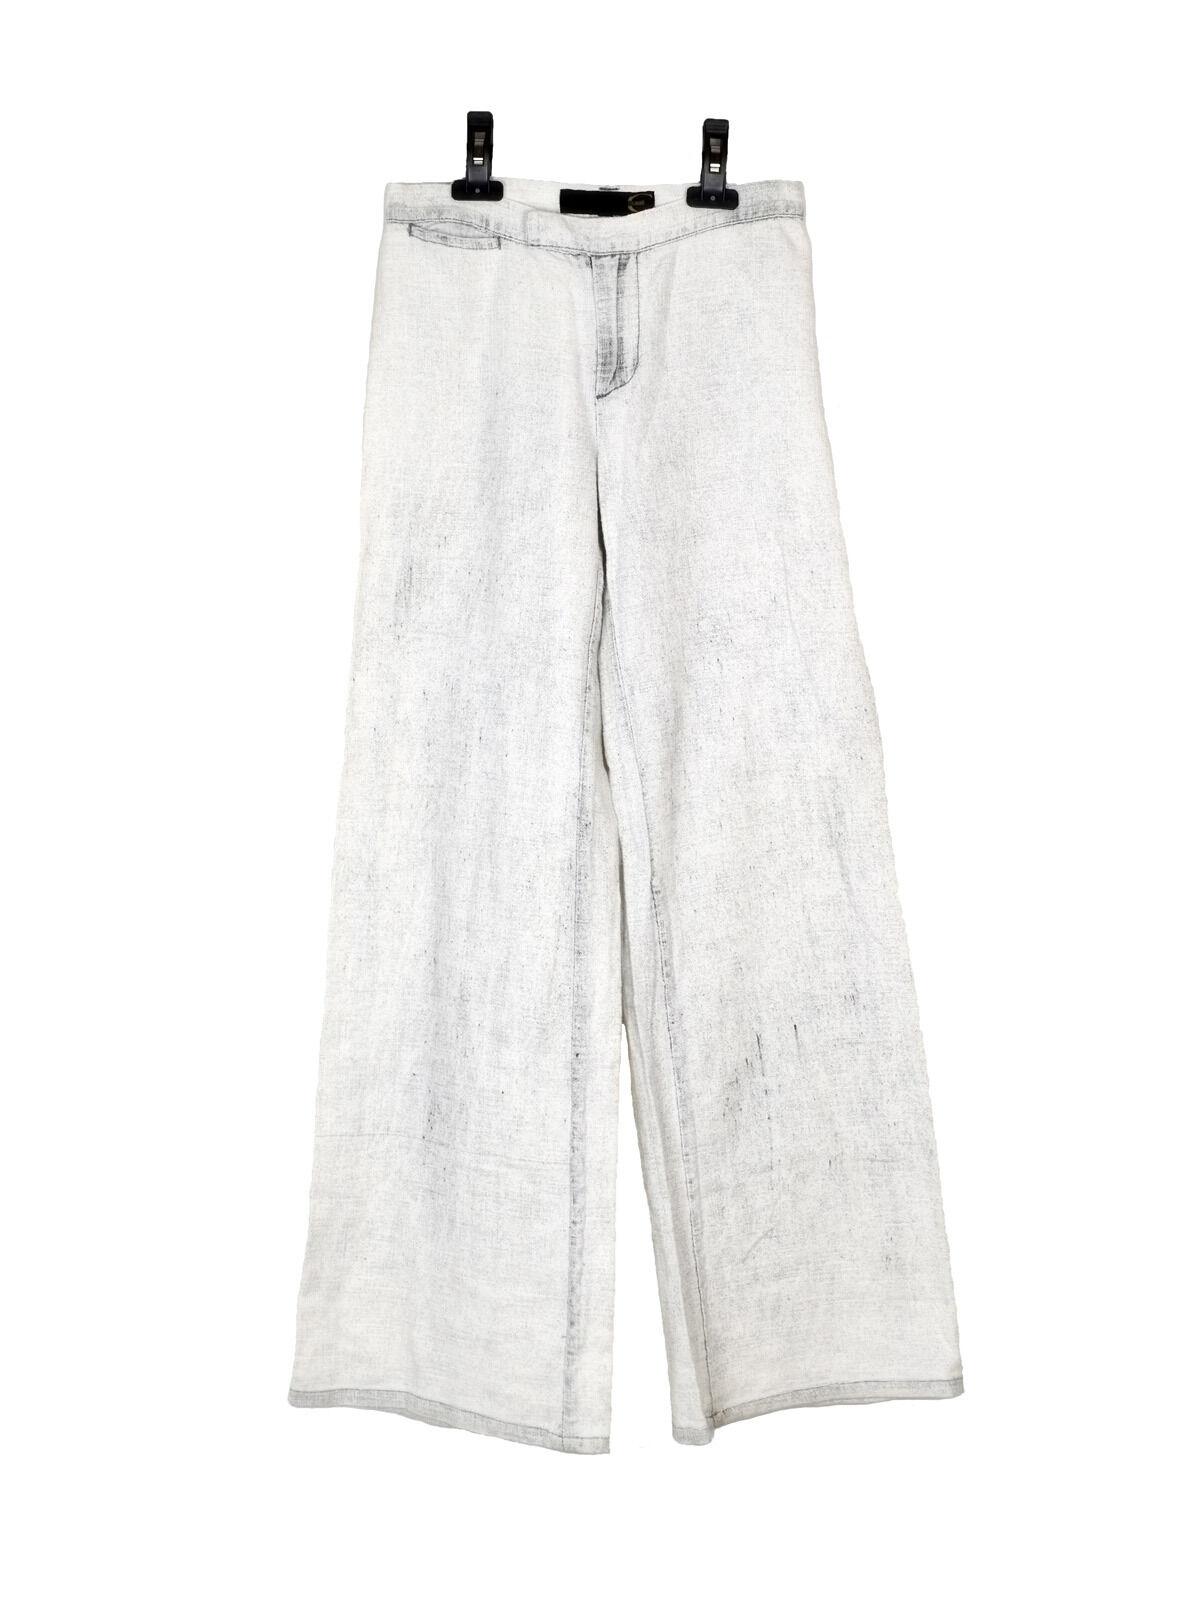 NEW Just Cavalli white stonewashed jeans